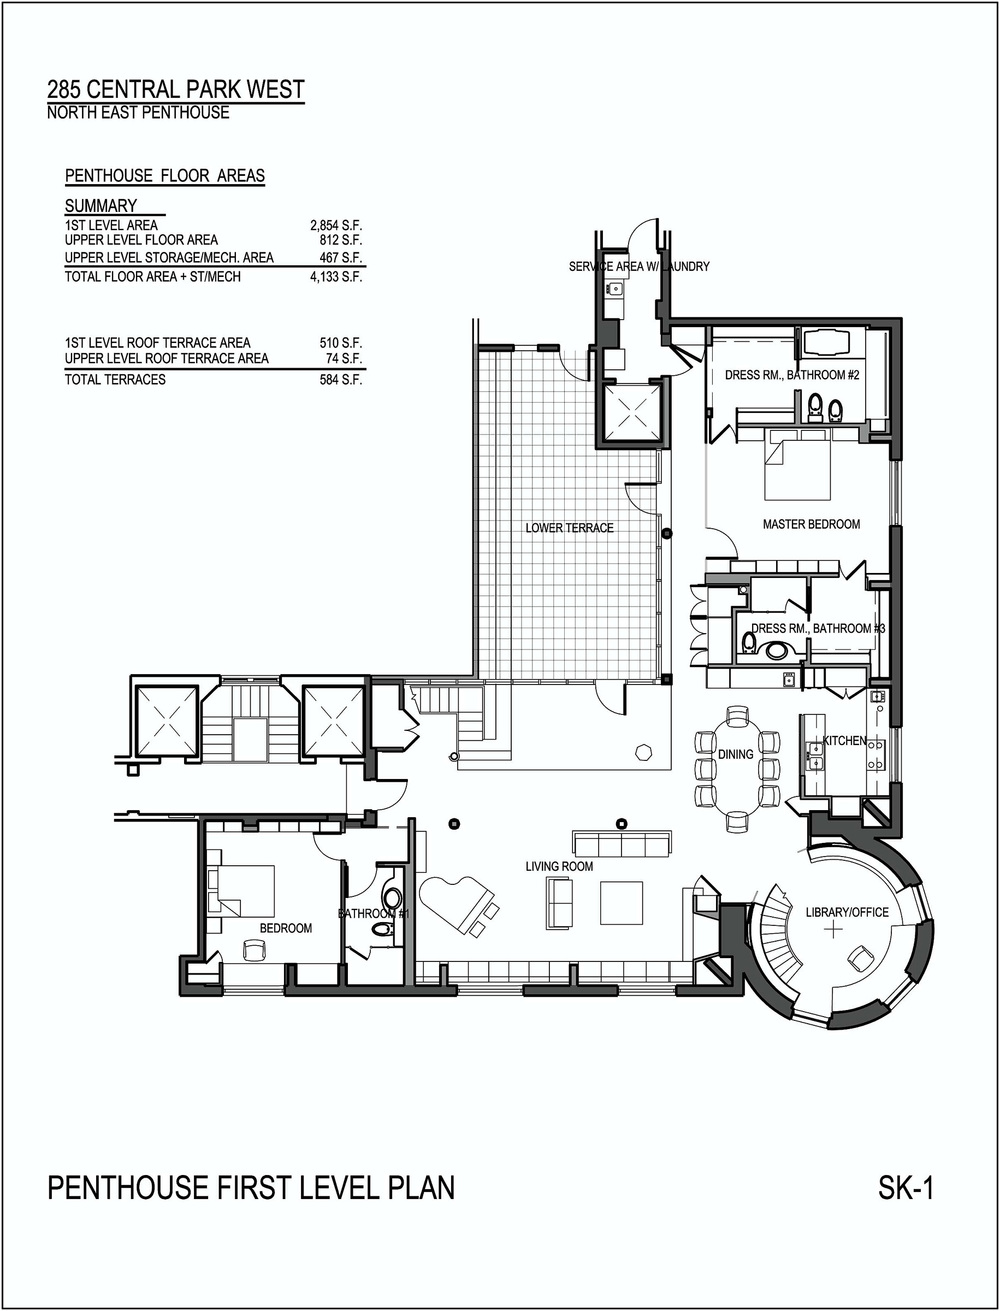 Penthouse Floor Plan sk-1.jpg